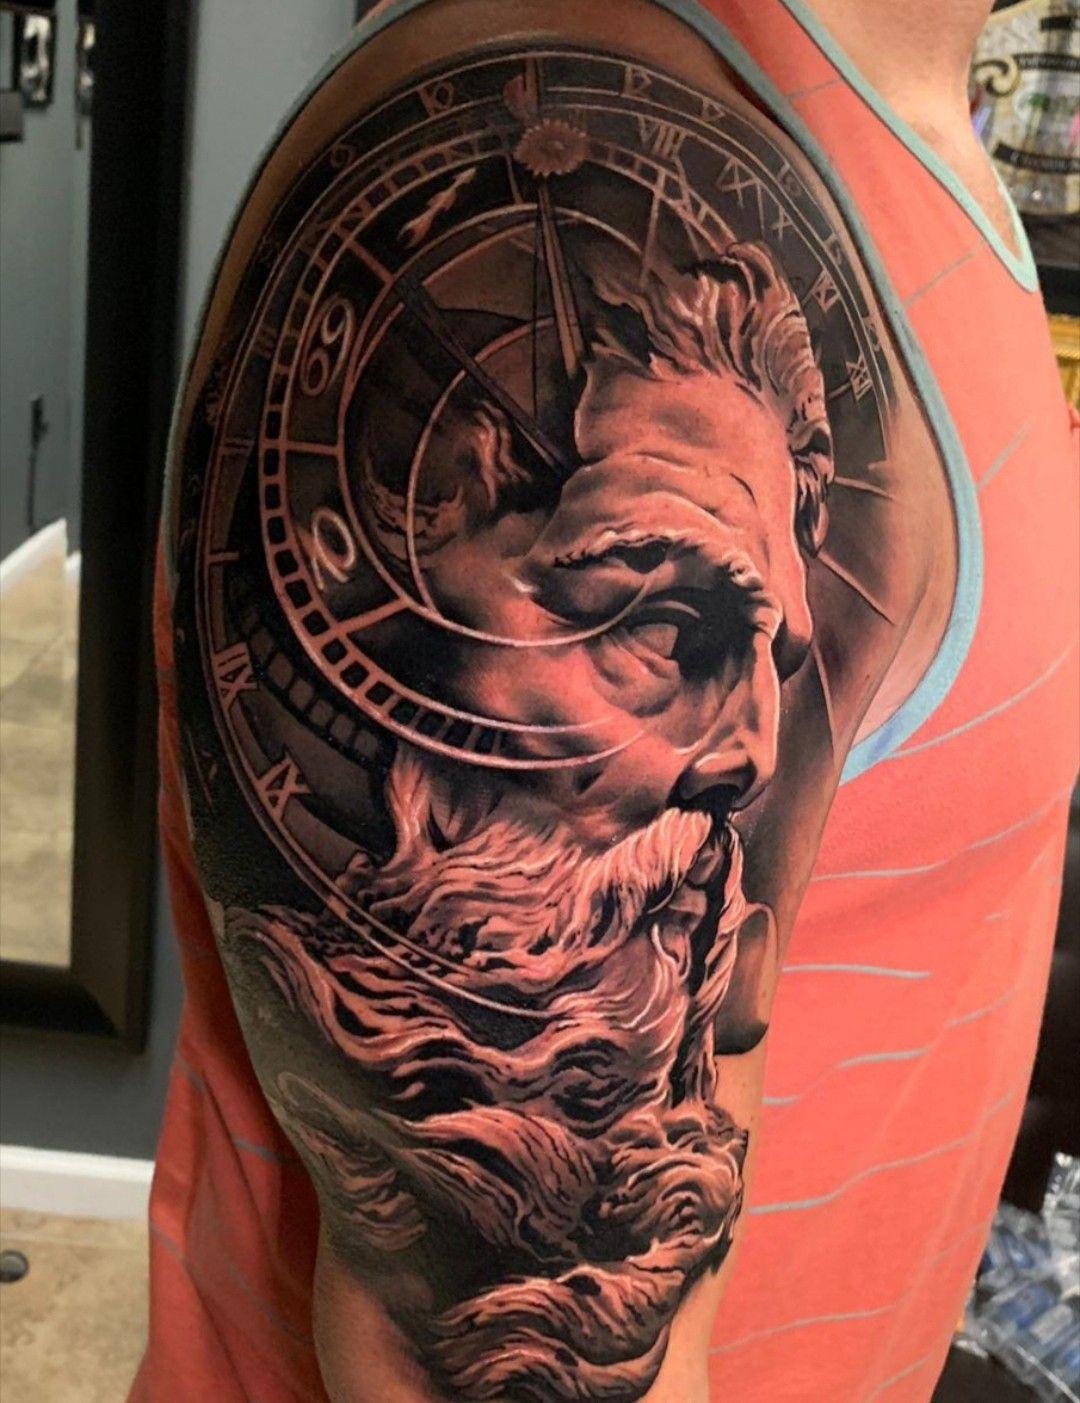 Nautical Tattoo Poseidon And Ship: Lyle's Poseidon Tattoo By BOLO. Realistic Black, Grey And